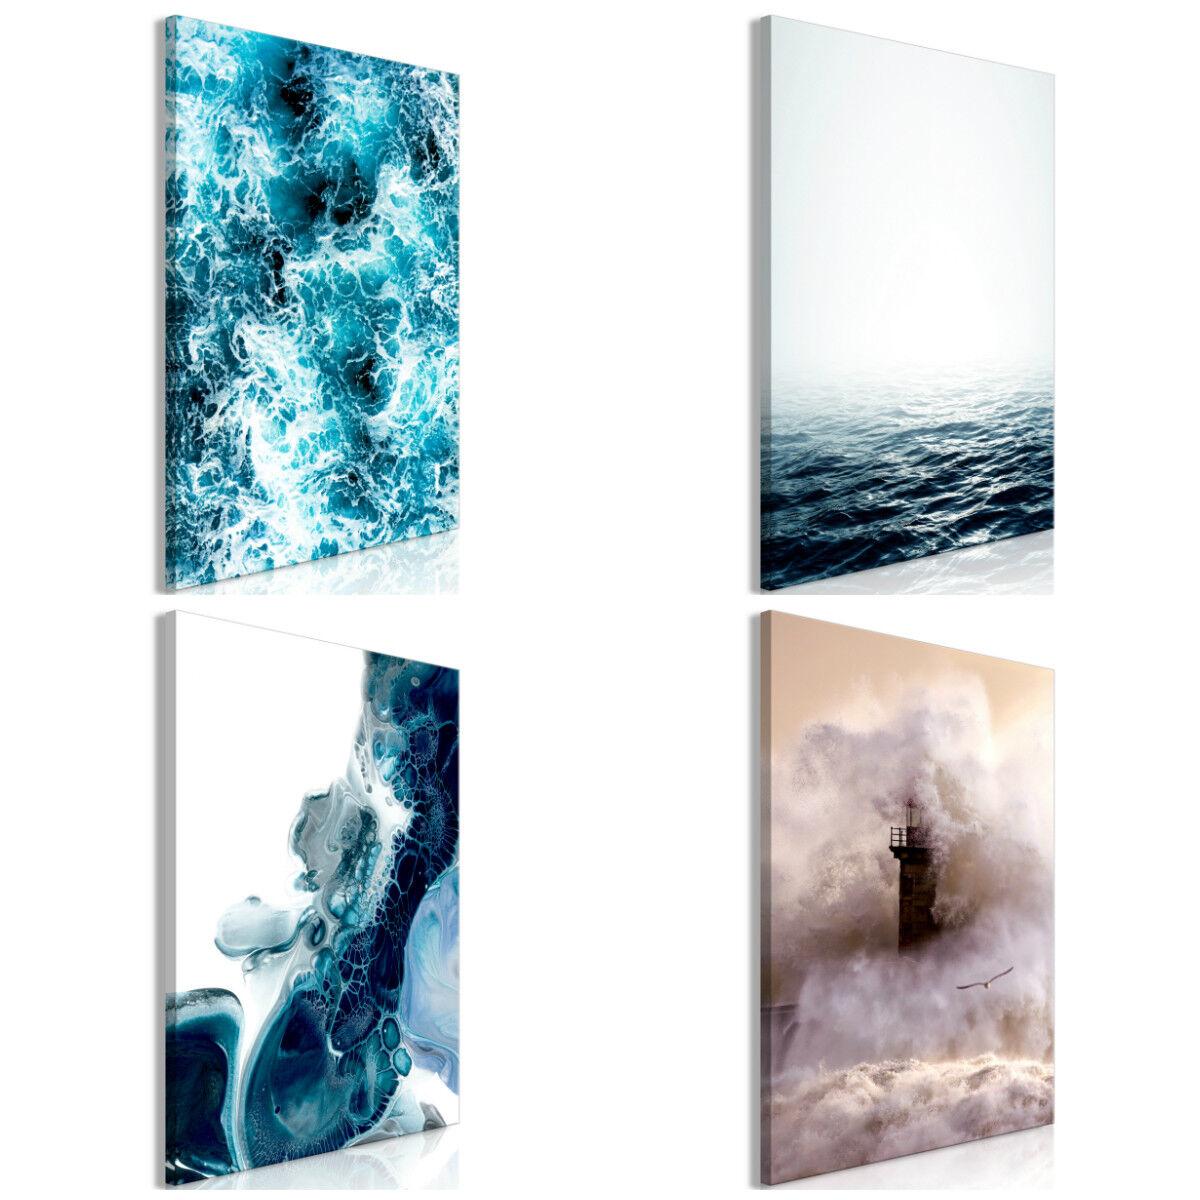 LEINWAND BILDER Meer Welle Landschaft Natur Bild Wandbilder Wohnzimmer 6 motiven